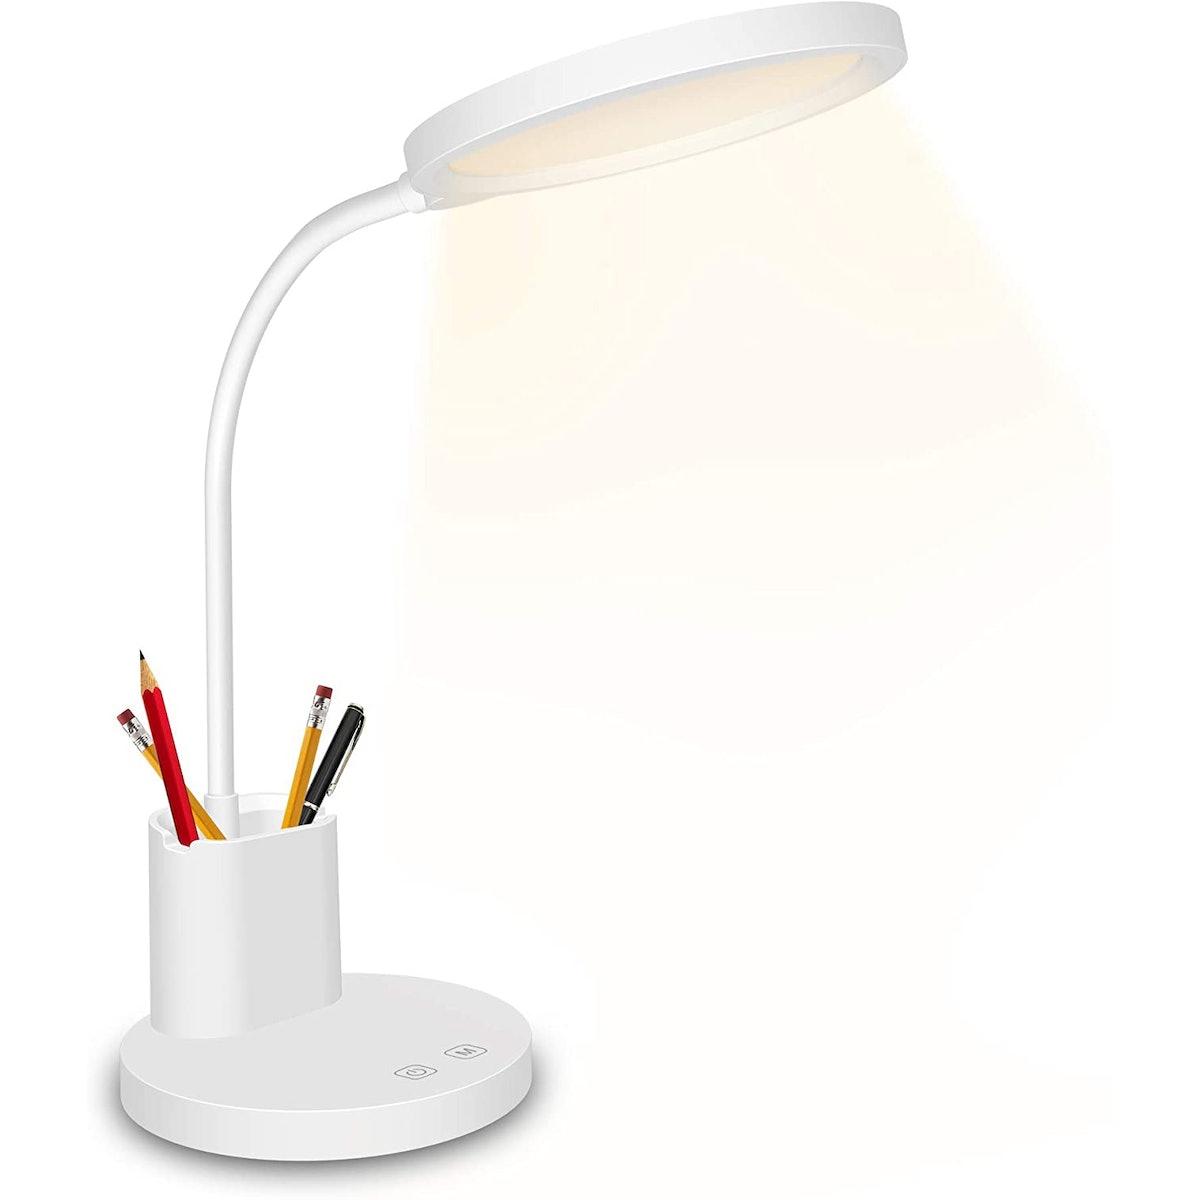 Golspark Rechargeable LED Desk Lamp